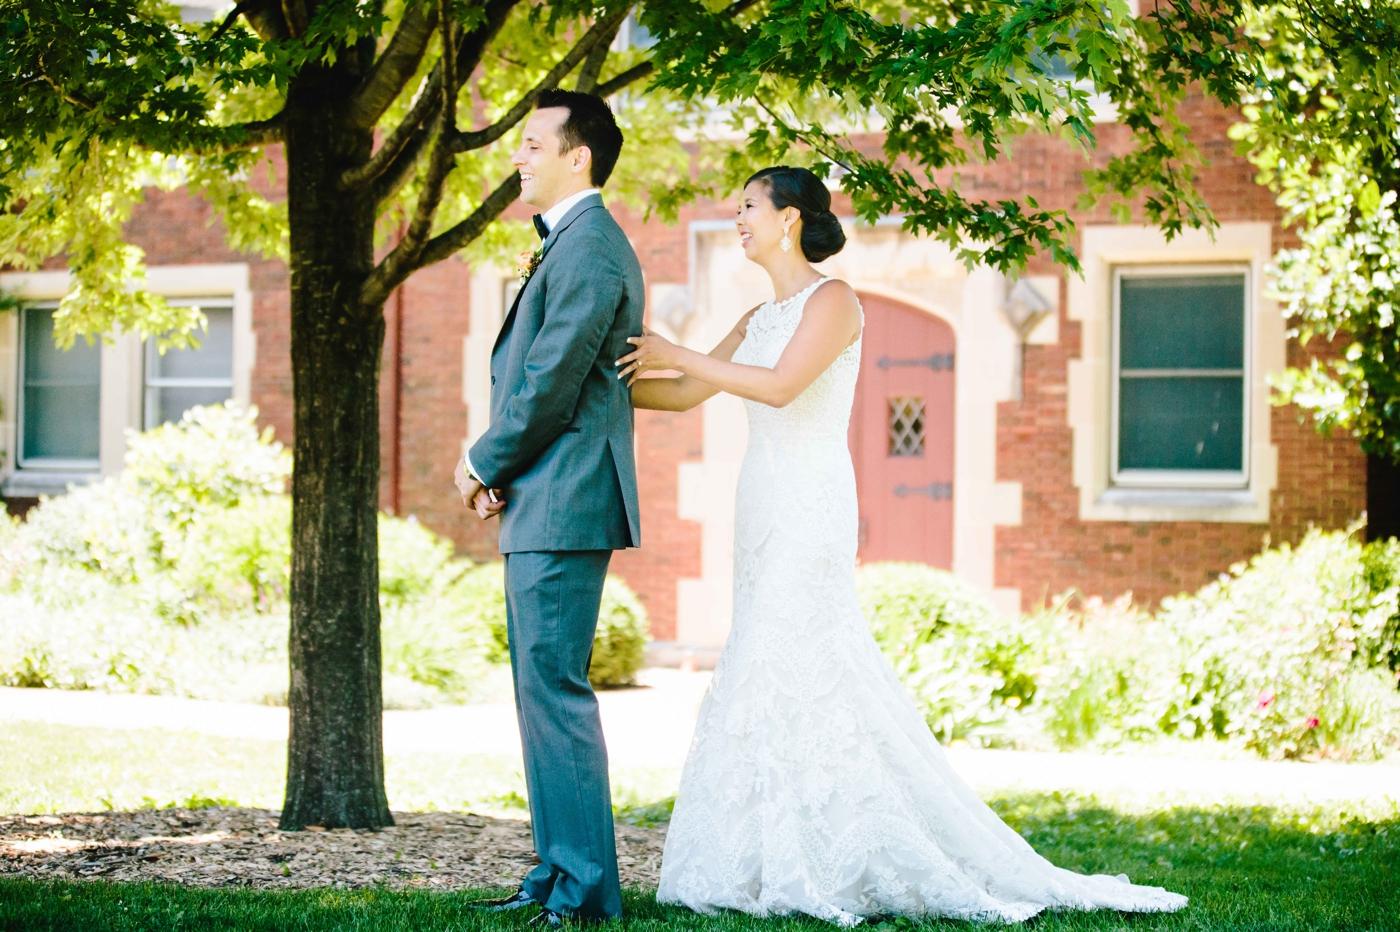 chicago-fine-art-wedding-photography-honey21